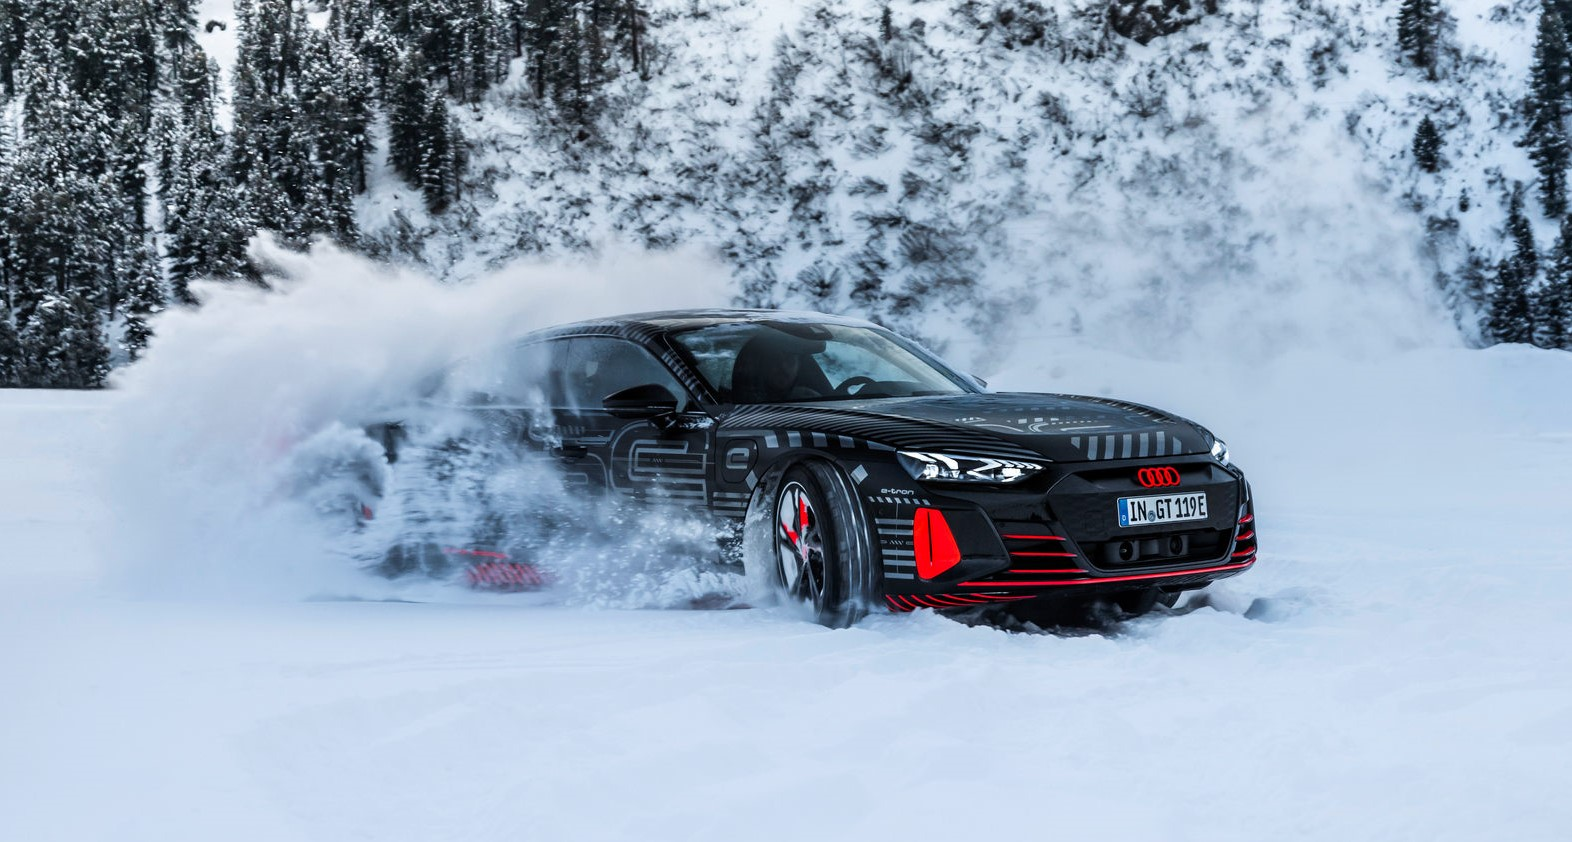 CIJENA 138.000 EURA?! Audi E-tron GT stiže 9. februara!